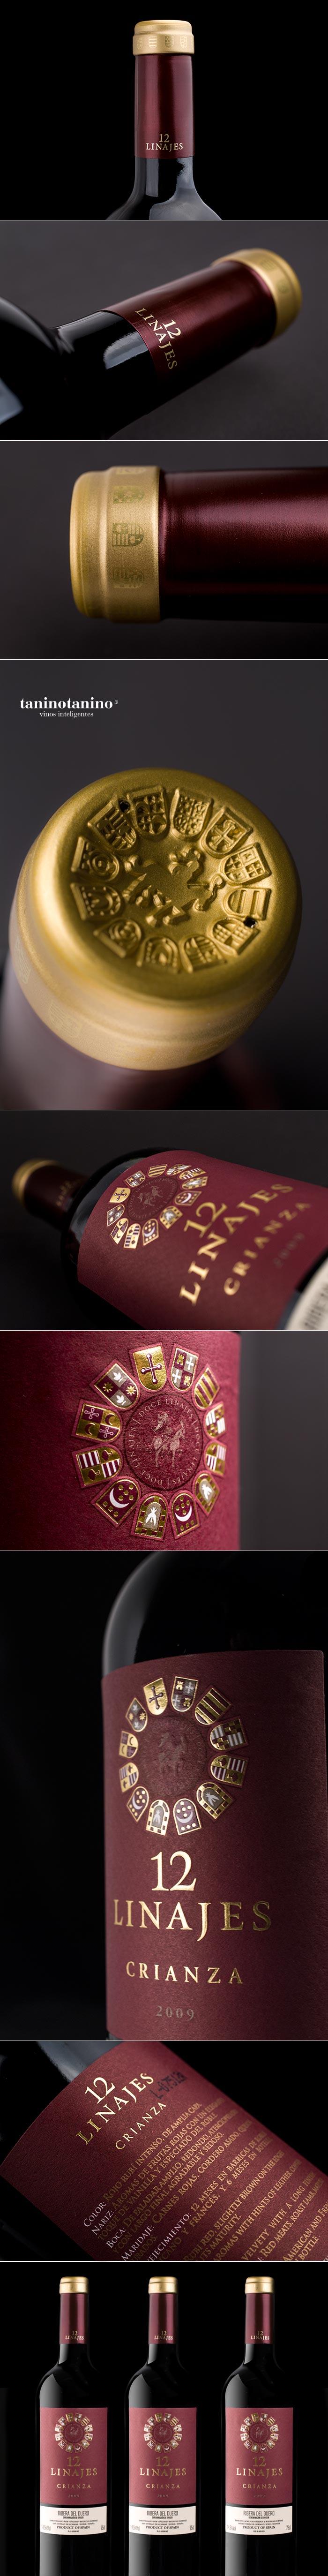 12 LINAJES CRIANZA HISPANO BODEGAS - TANINOTANINO VINOS INTELIGENTES wine / vinho / vino mxm